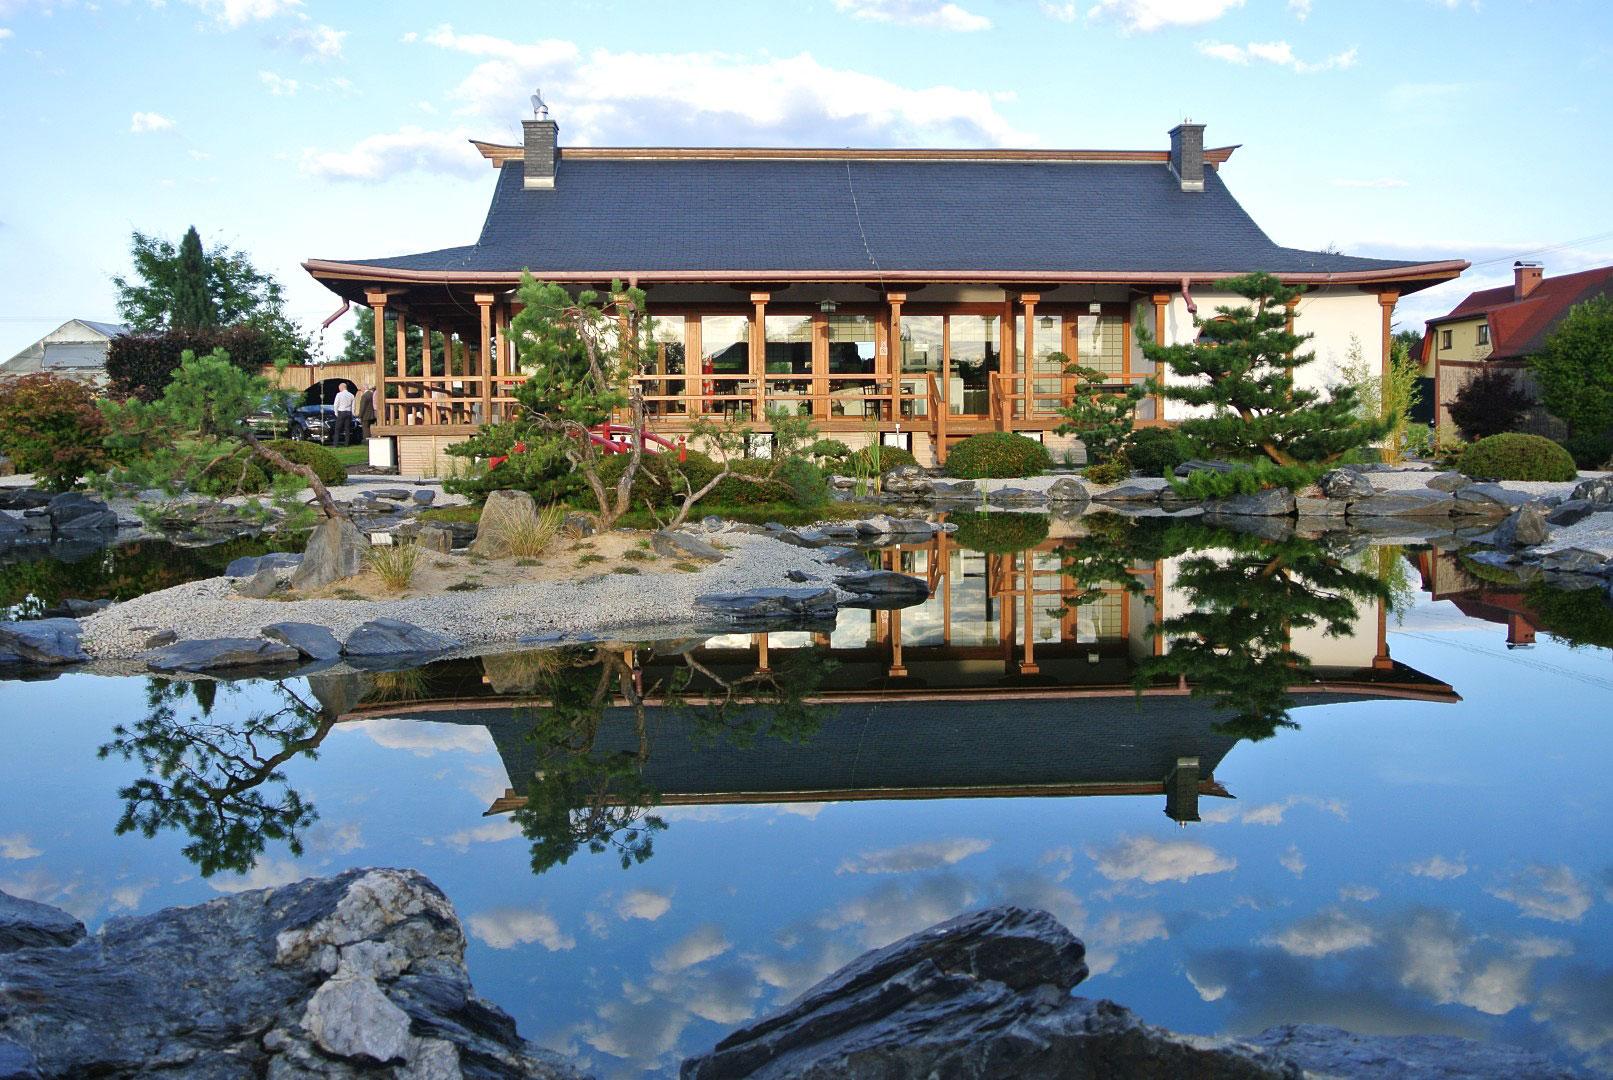 ogrod-japonski-herbaciarnia-pisarzowice